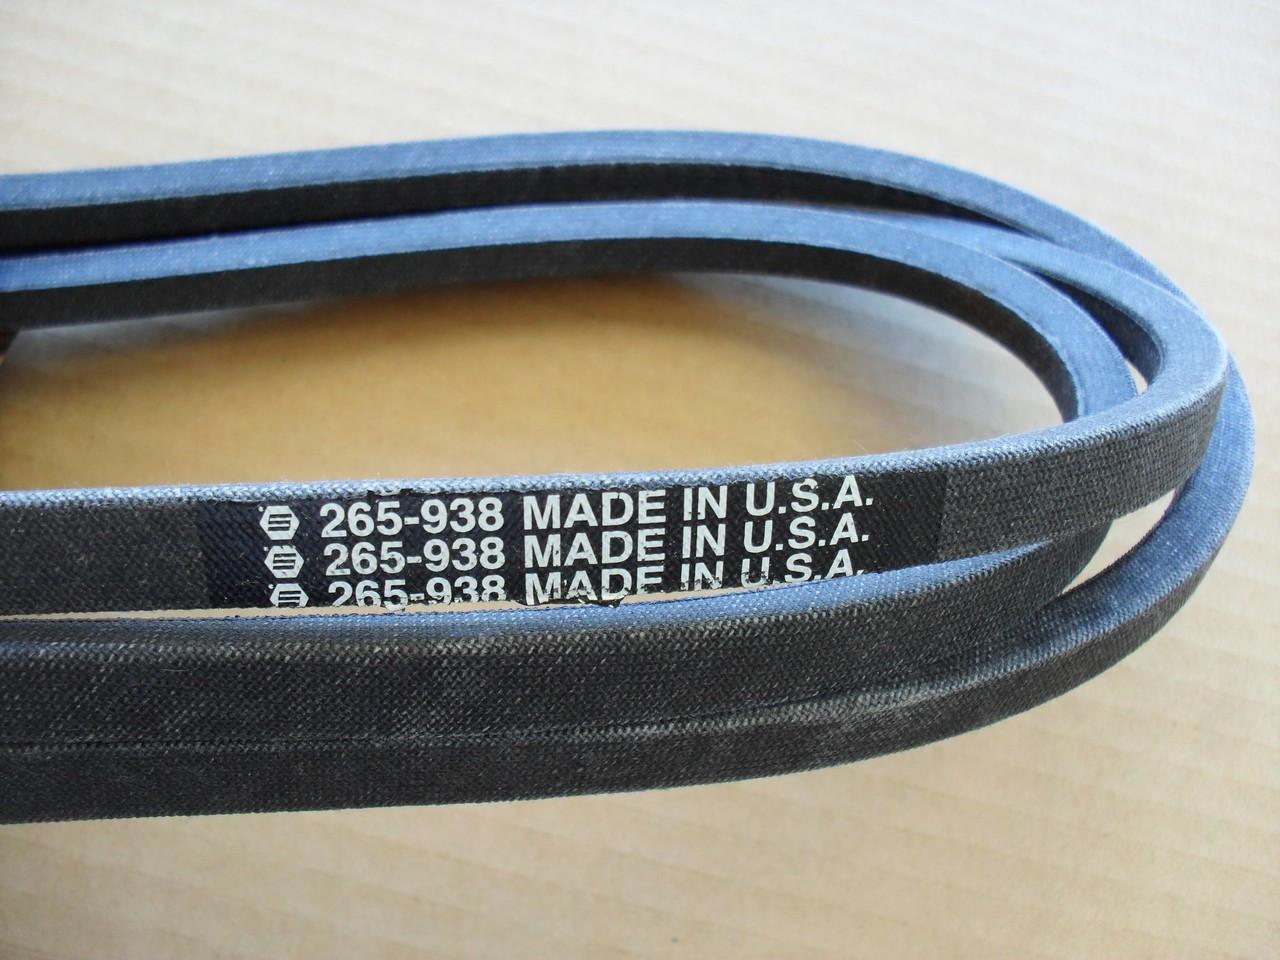 "Deck Belt for Ariens YT19H 42"" Cut 21547082, 21547188, 21547027"